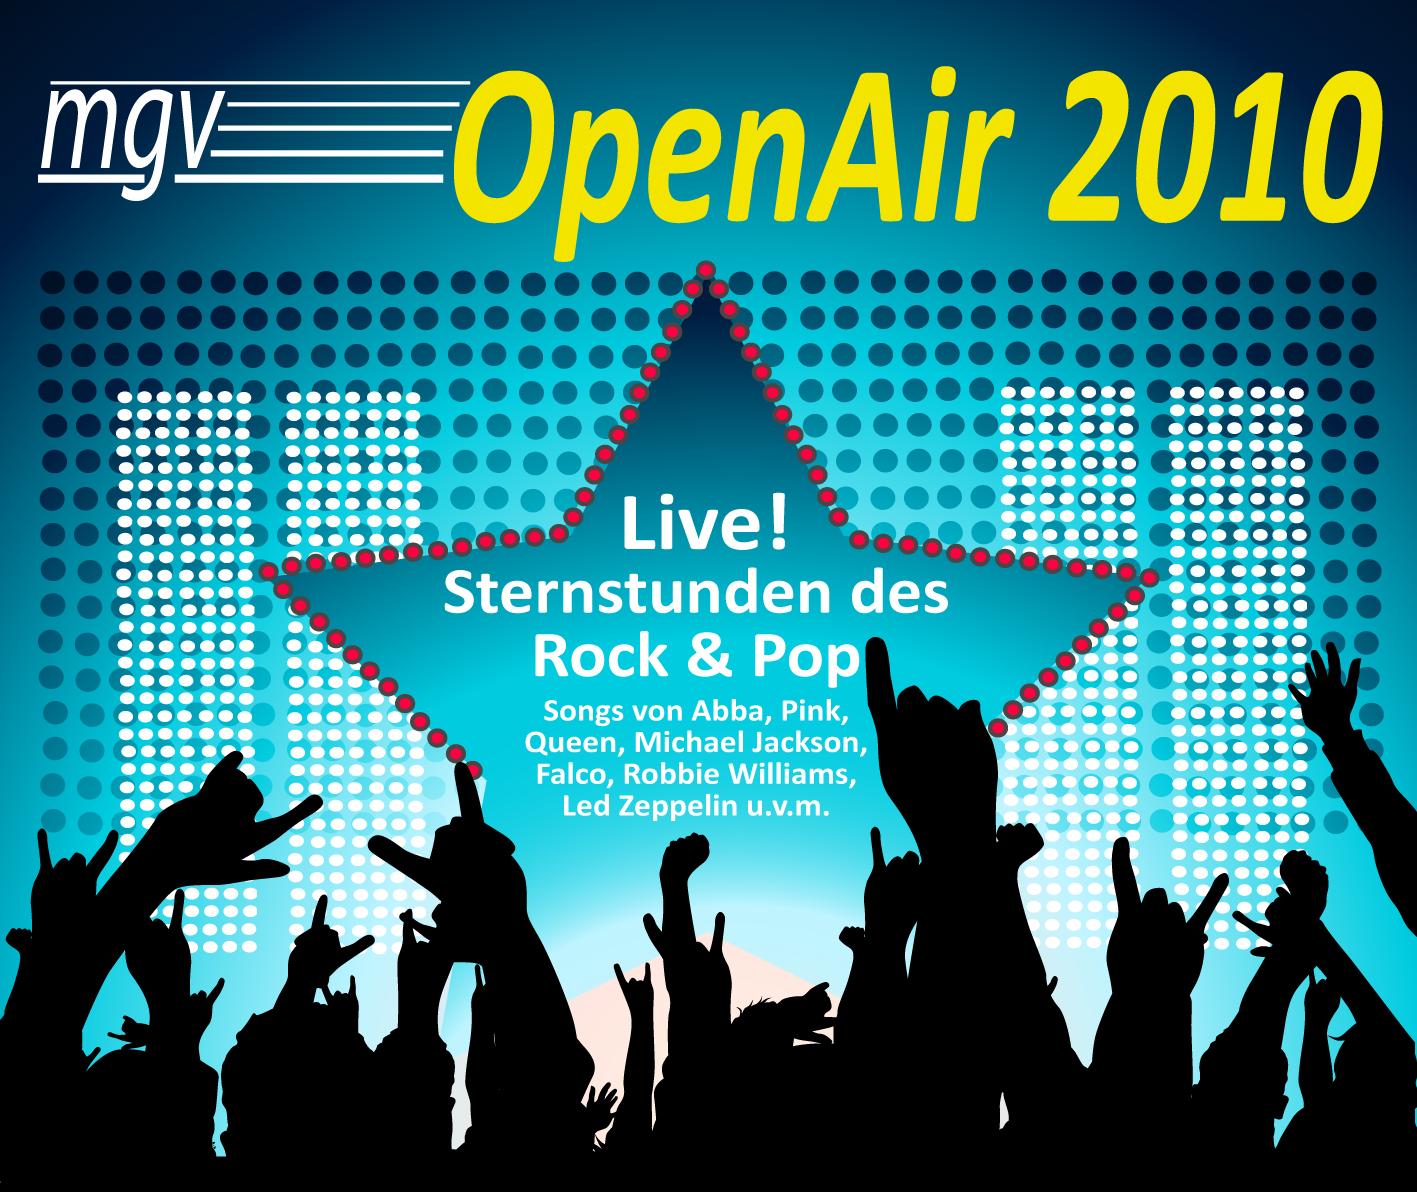 OpenAir2010_CD_Cover